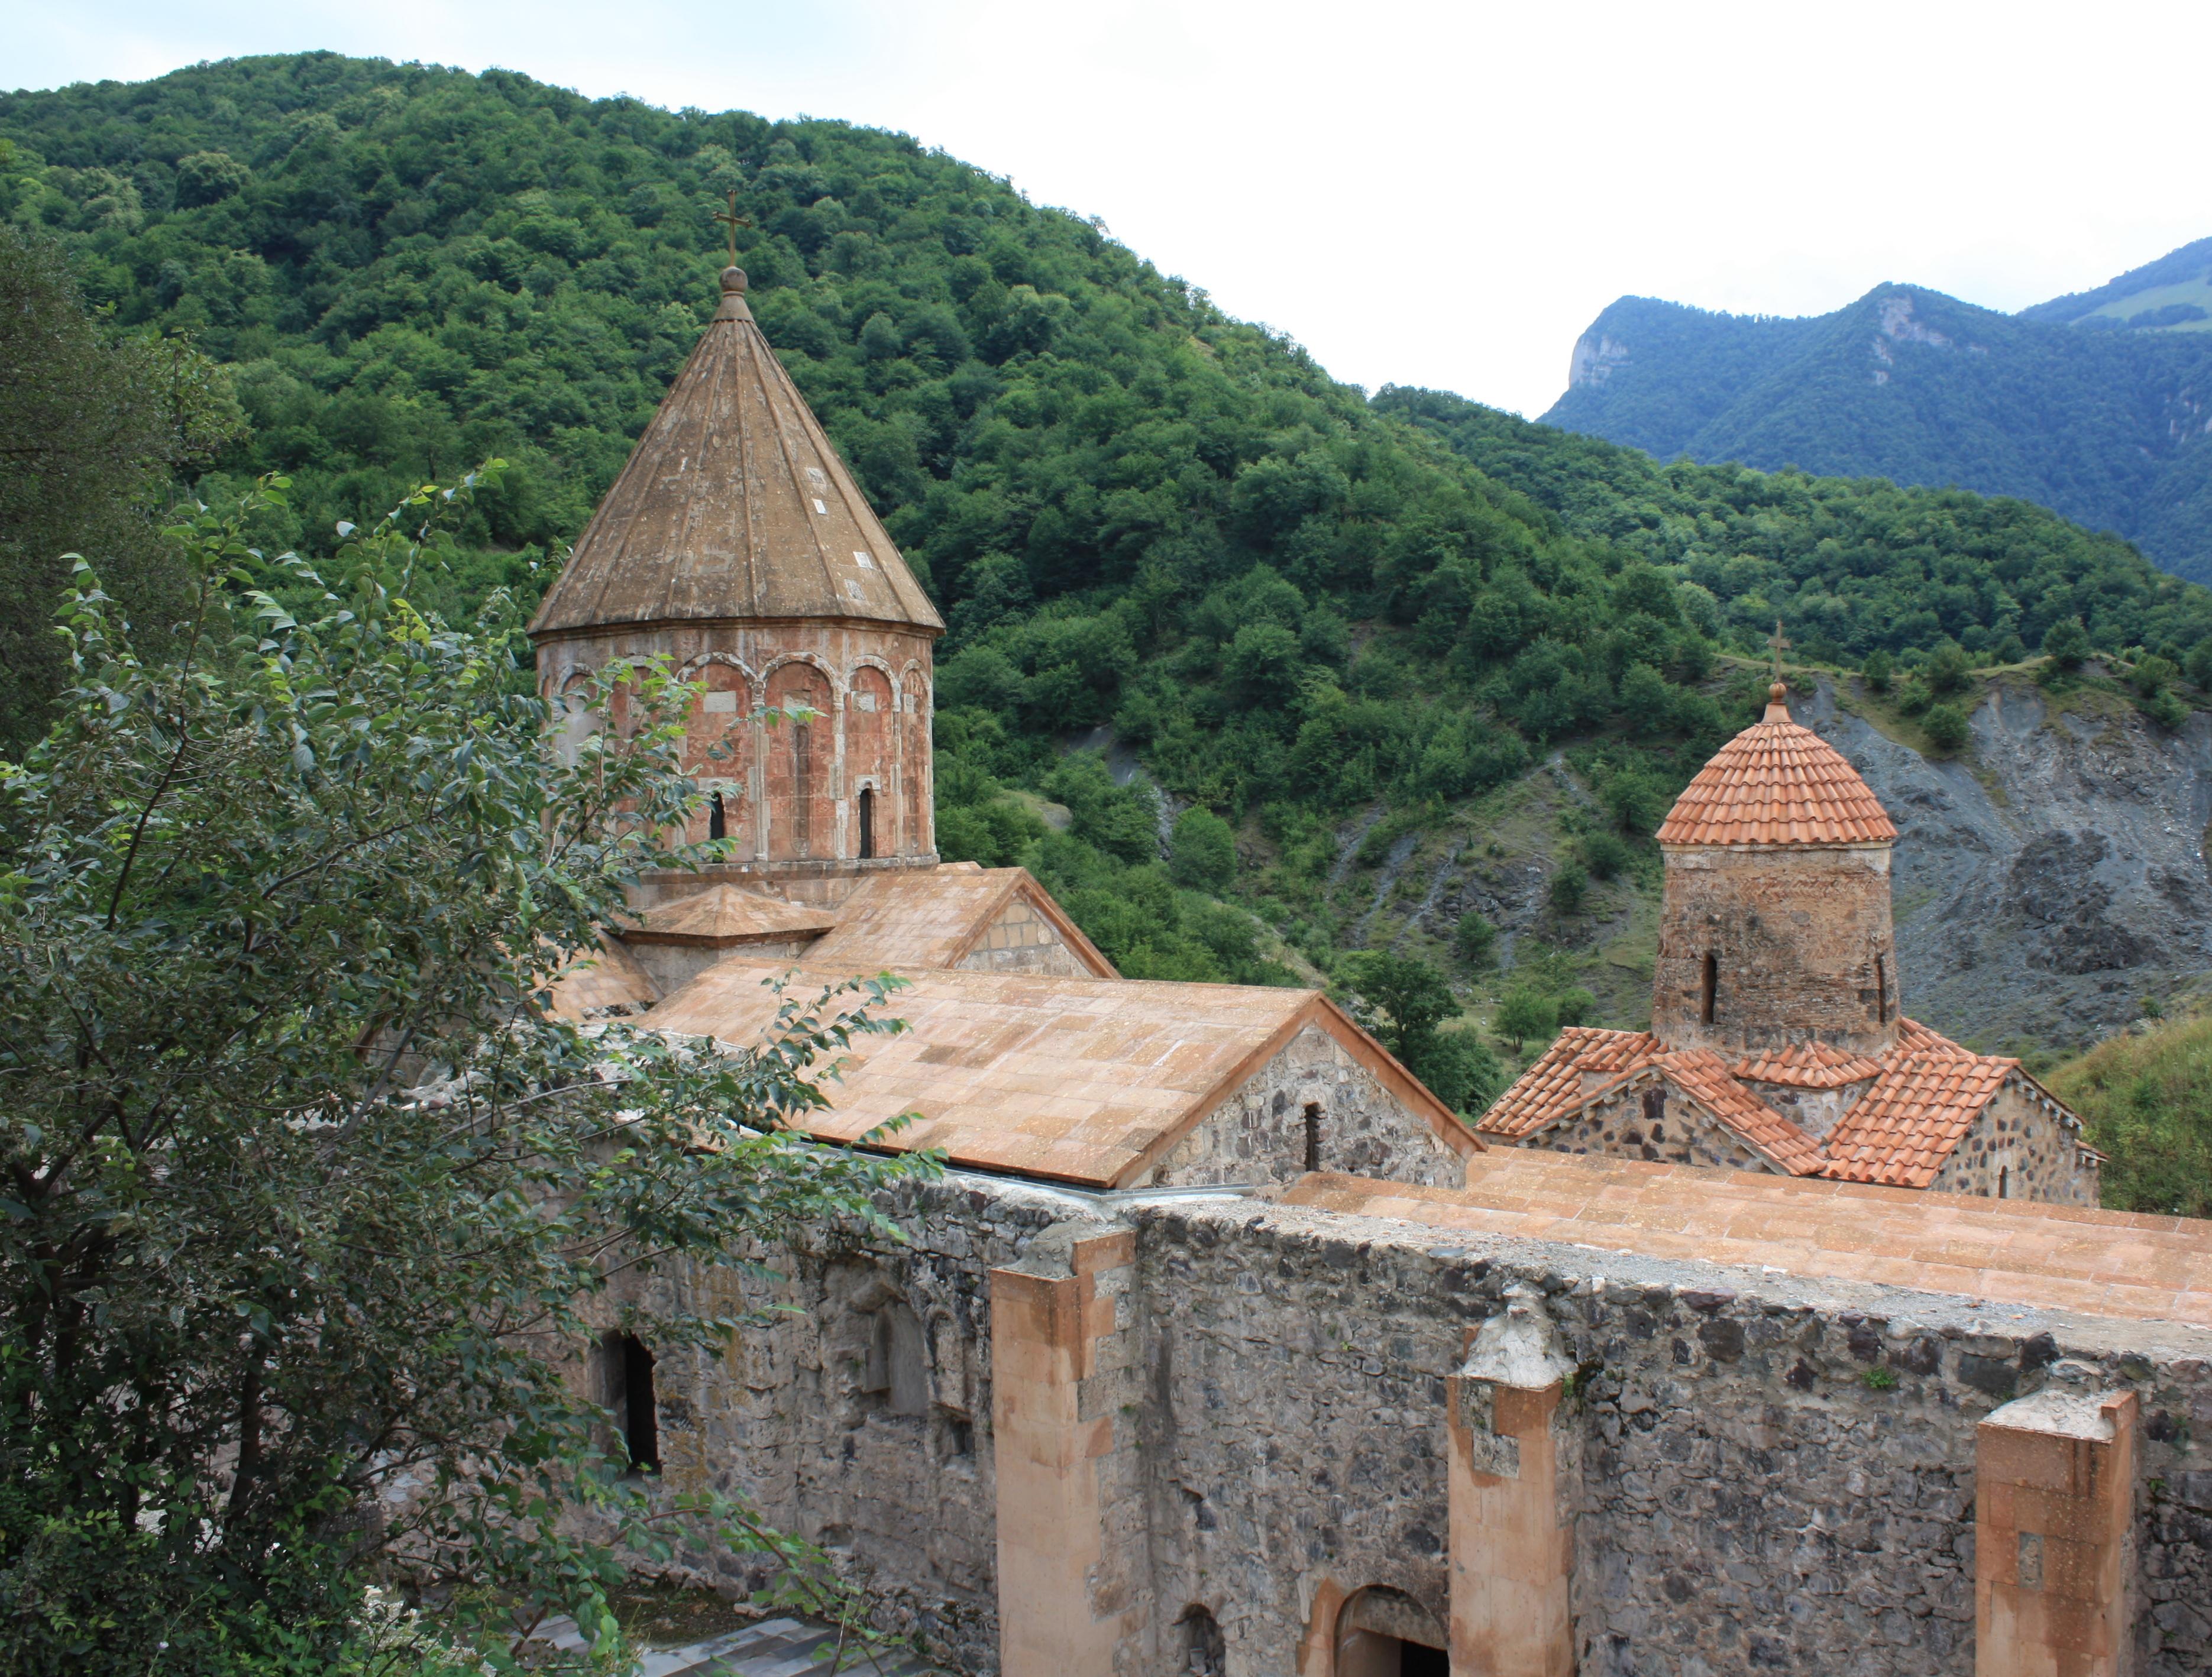 Dadivank (Photo: Wikimedia Commons)